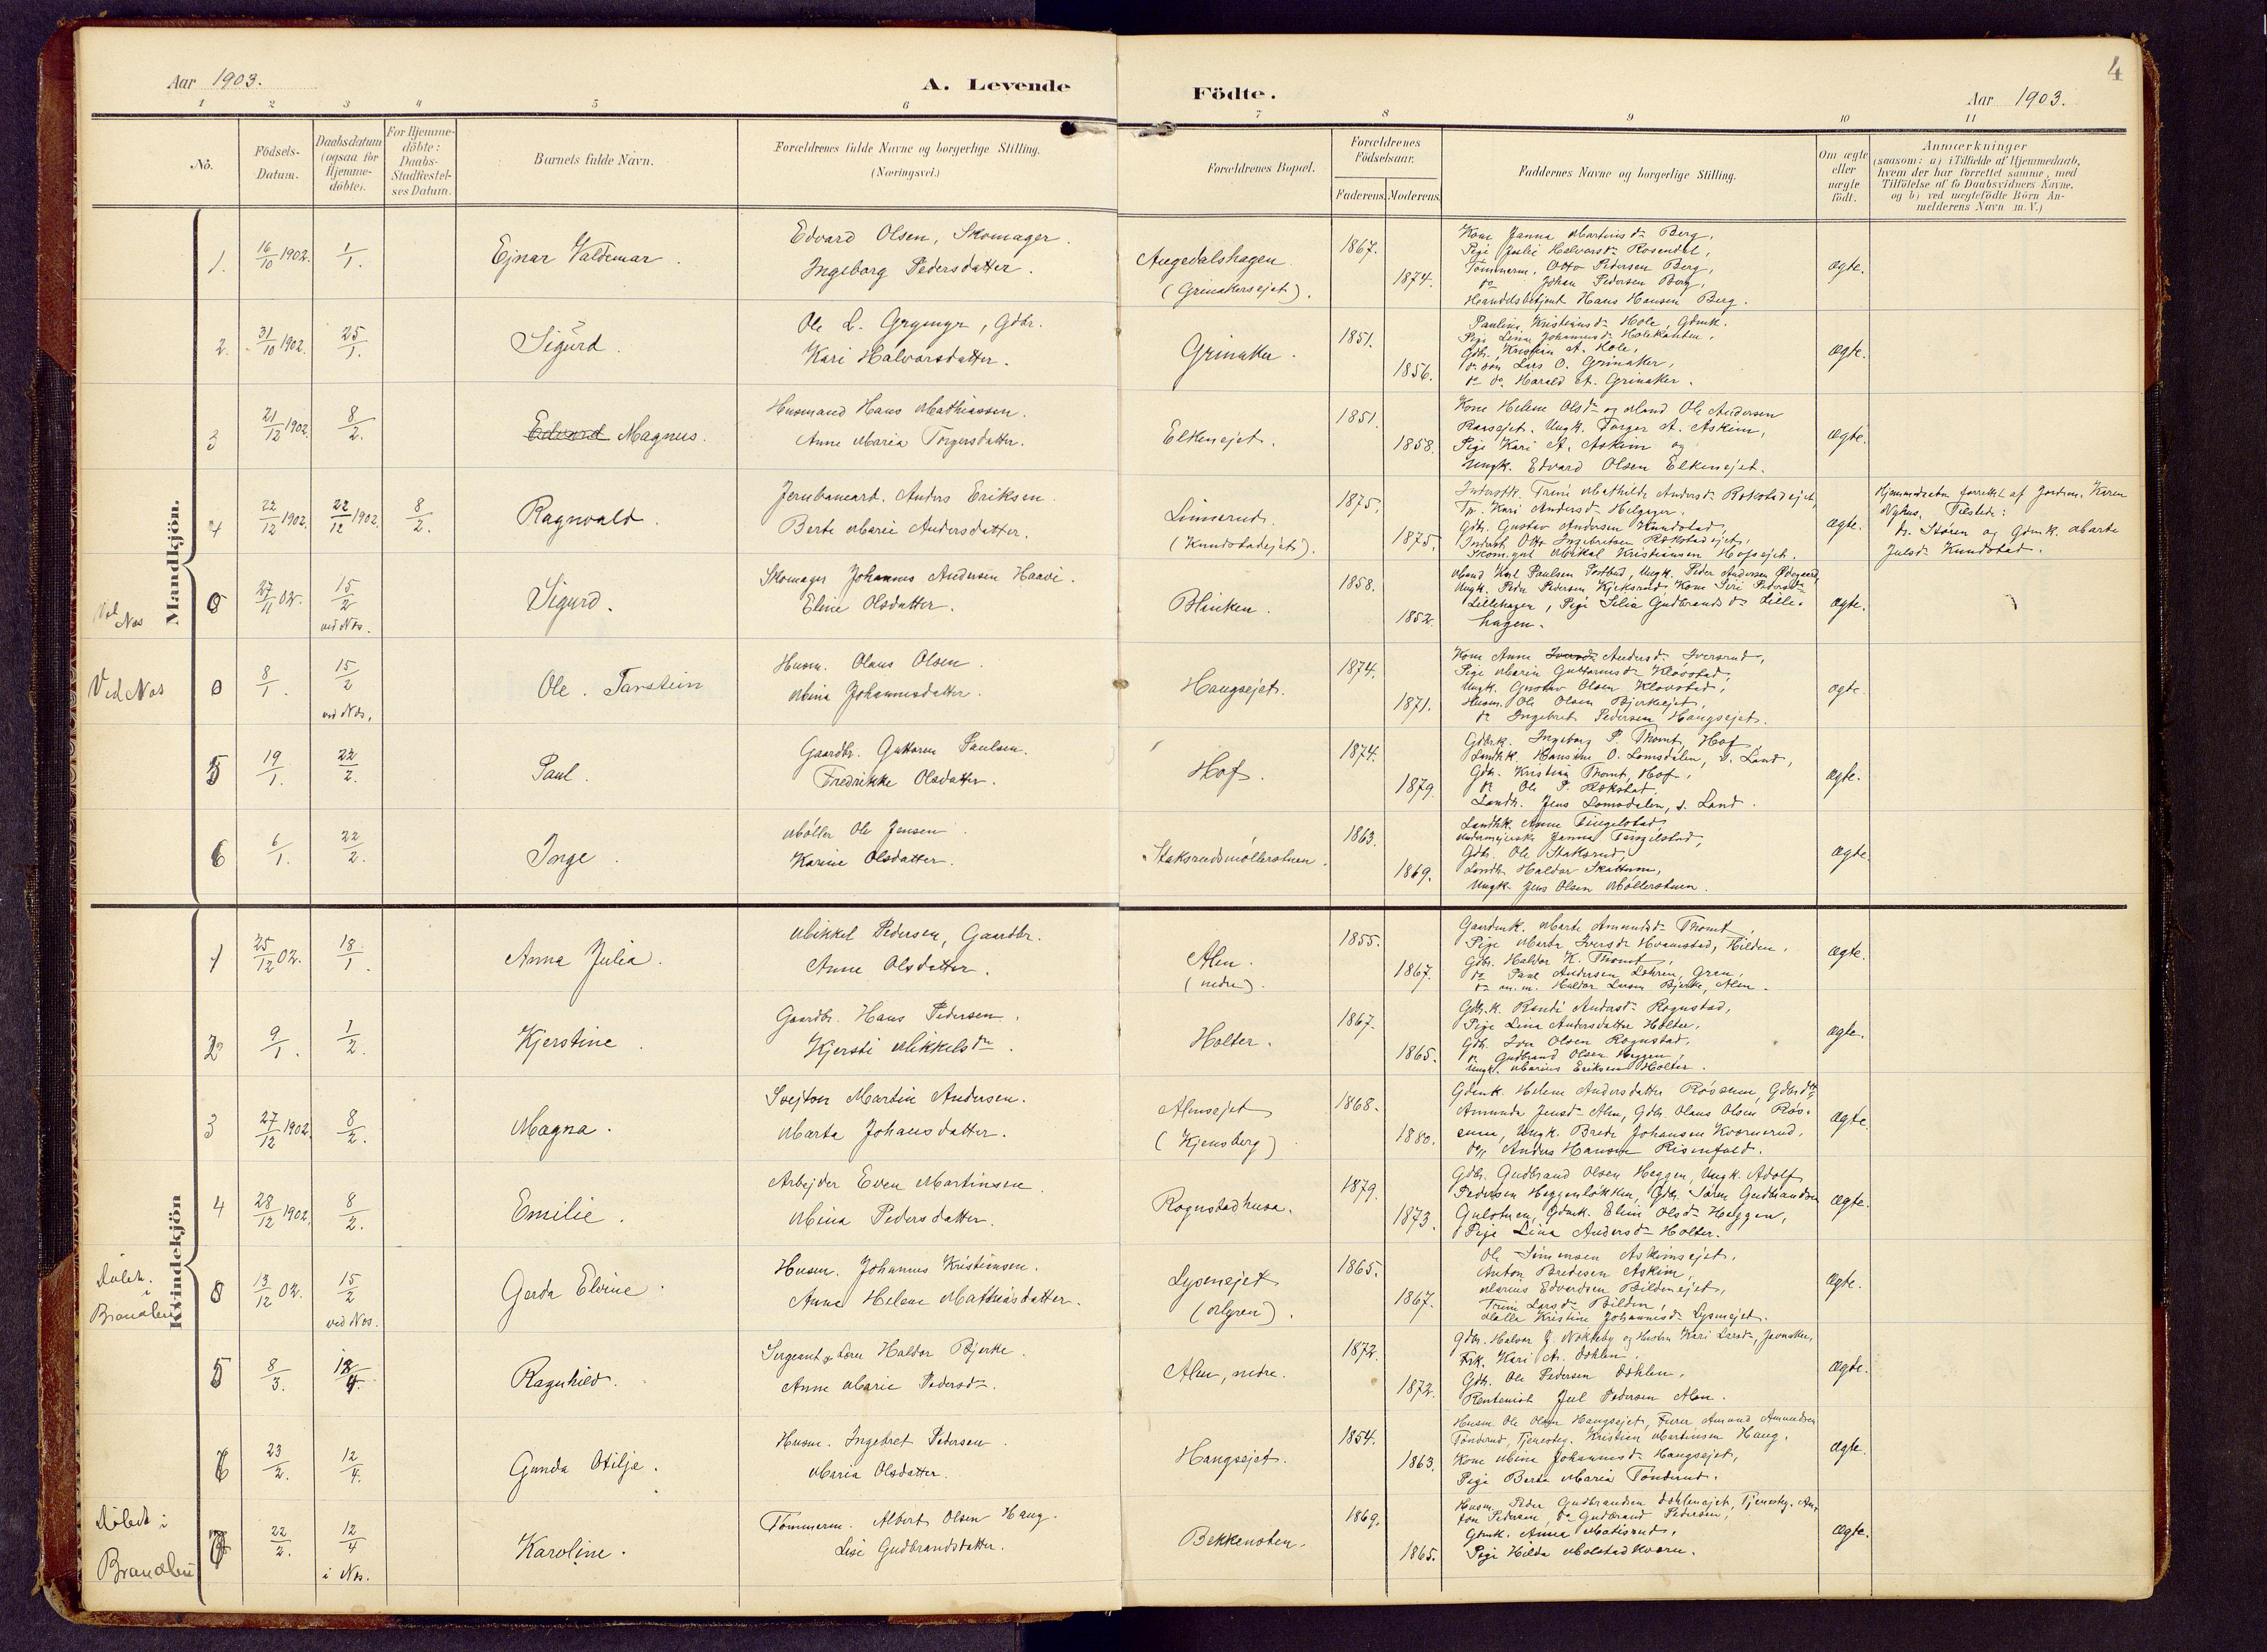 SAH, Brandbu prestekontor, Klokkerbok nr. 9, 1903-1916, s. 4